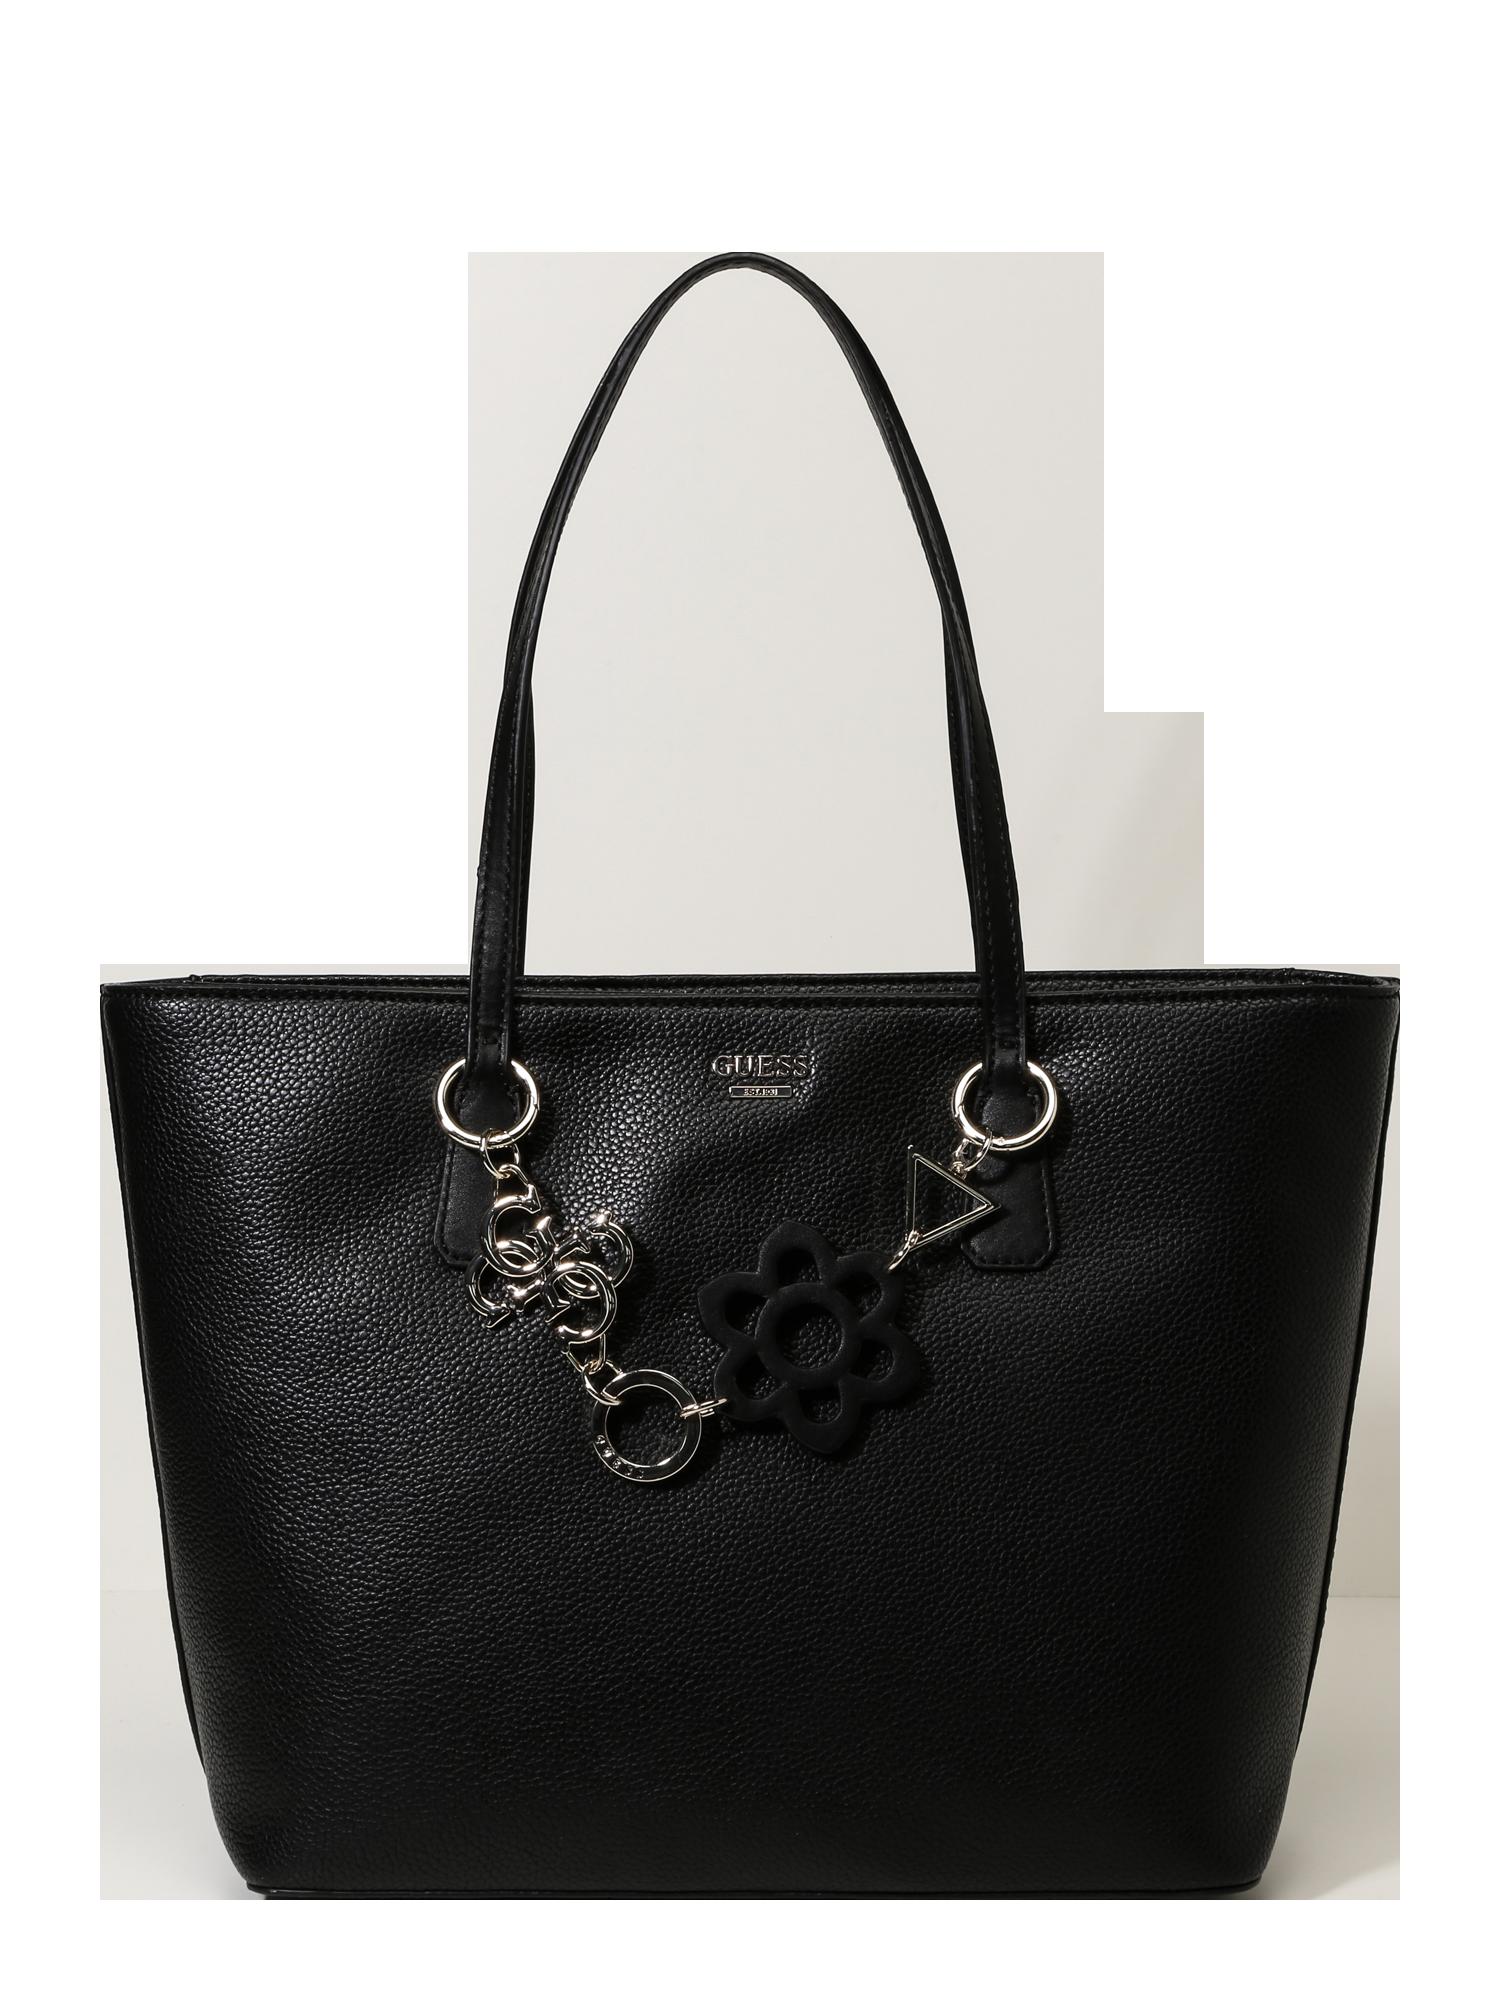 GUESS Shopper 'DANIA' schwarz | Damen shopper, Shopper und